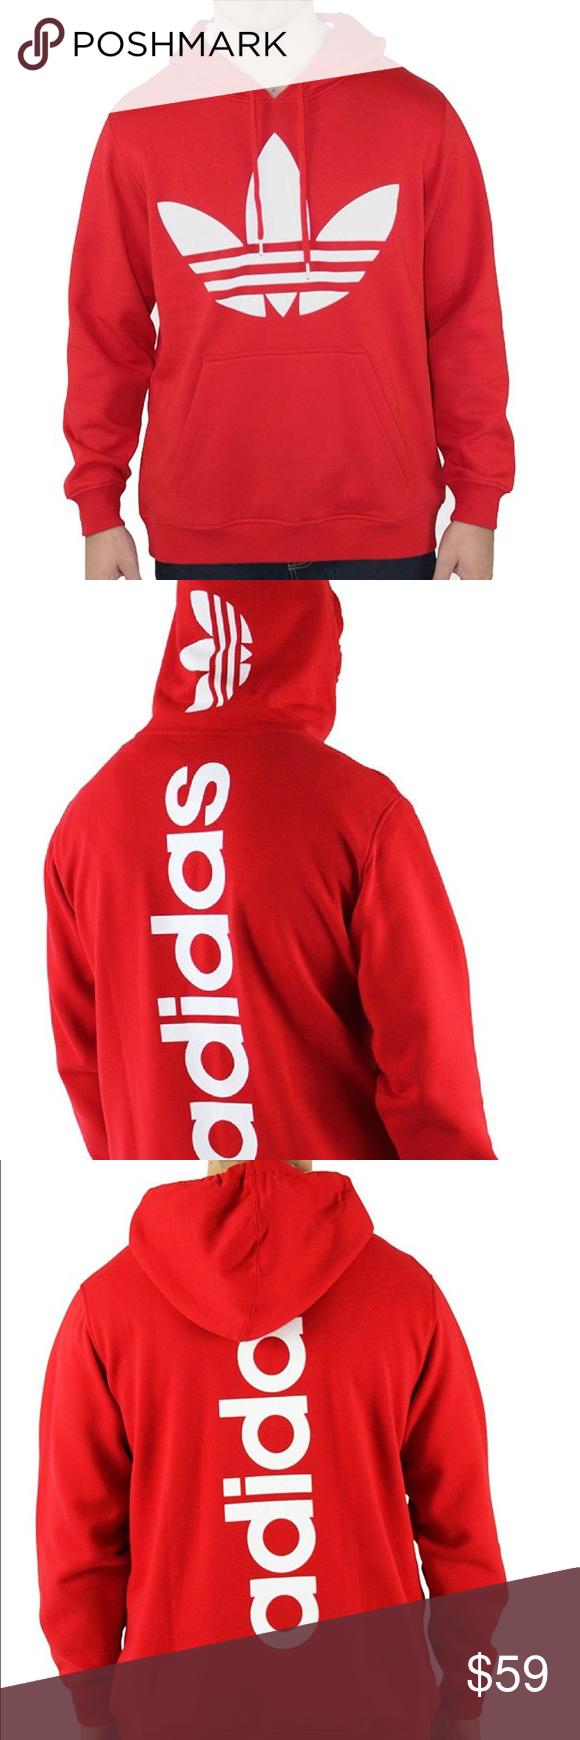 Biblia Polinizar Intacto  🏷Sale Adidas Originals Trefoil Logo Hoodie Men XL | Adidas outfit men, Mens  outfits, Hoodies men